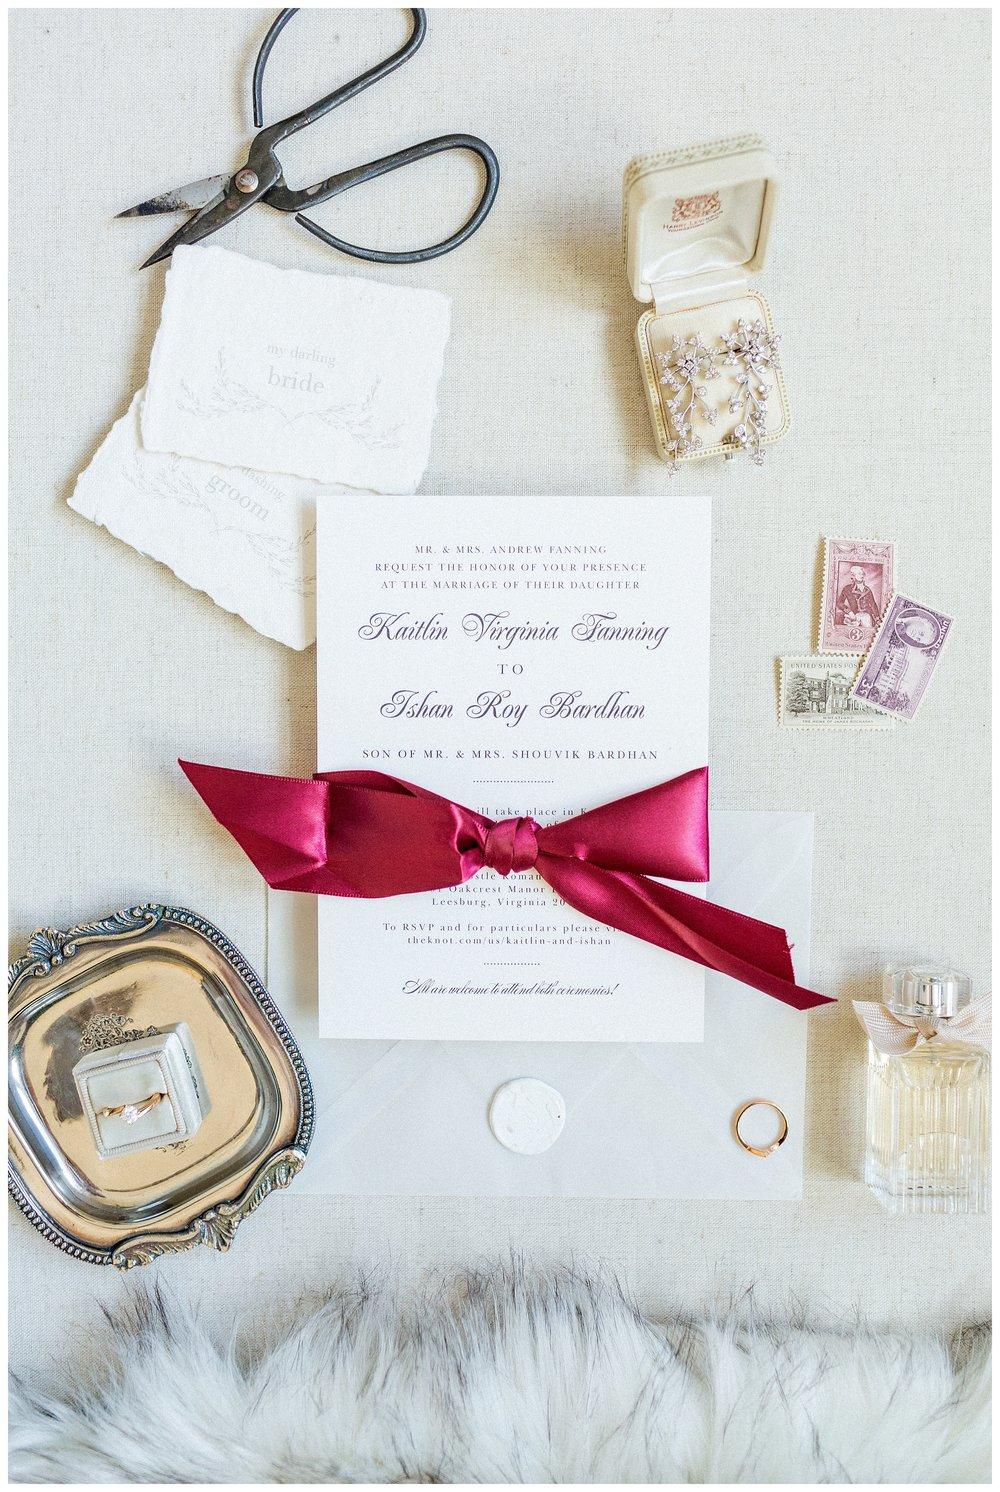 Stone Tower Winery Wedding | Virginia Winter Wedding | VA Wedding Photographer Kir Tuben_0037.jpg